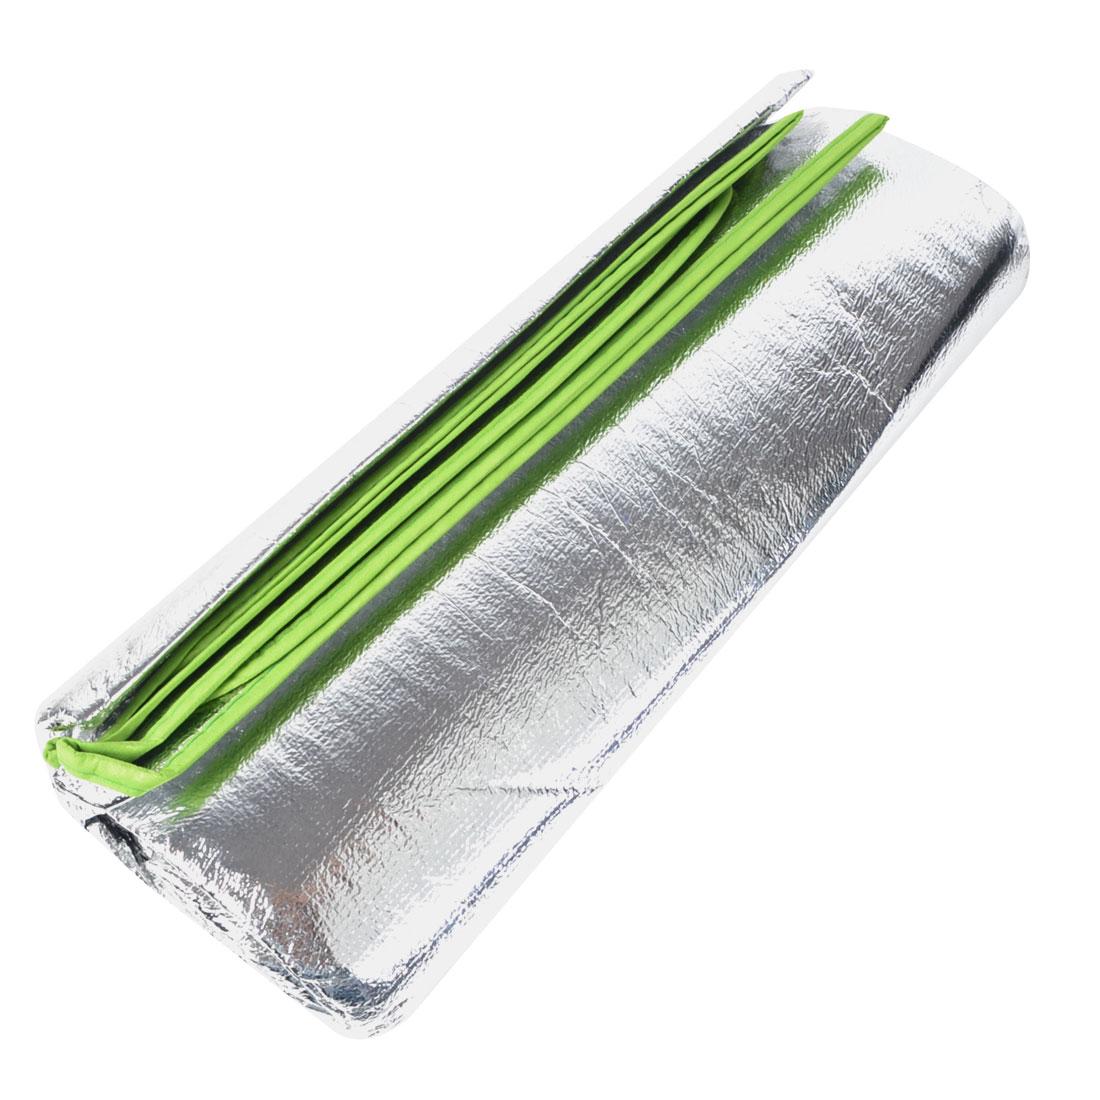 Sponge Lining Aluminum Foil Surface Dampproof Outdoor Picnic Mat 2M x 1.5M